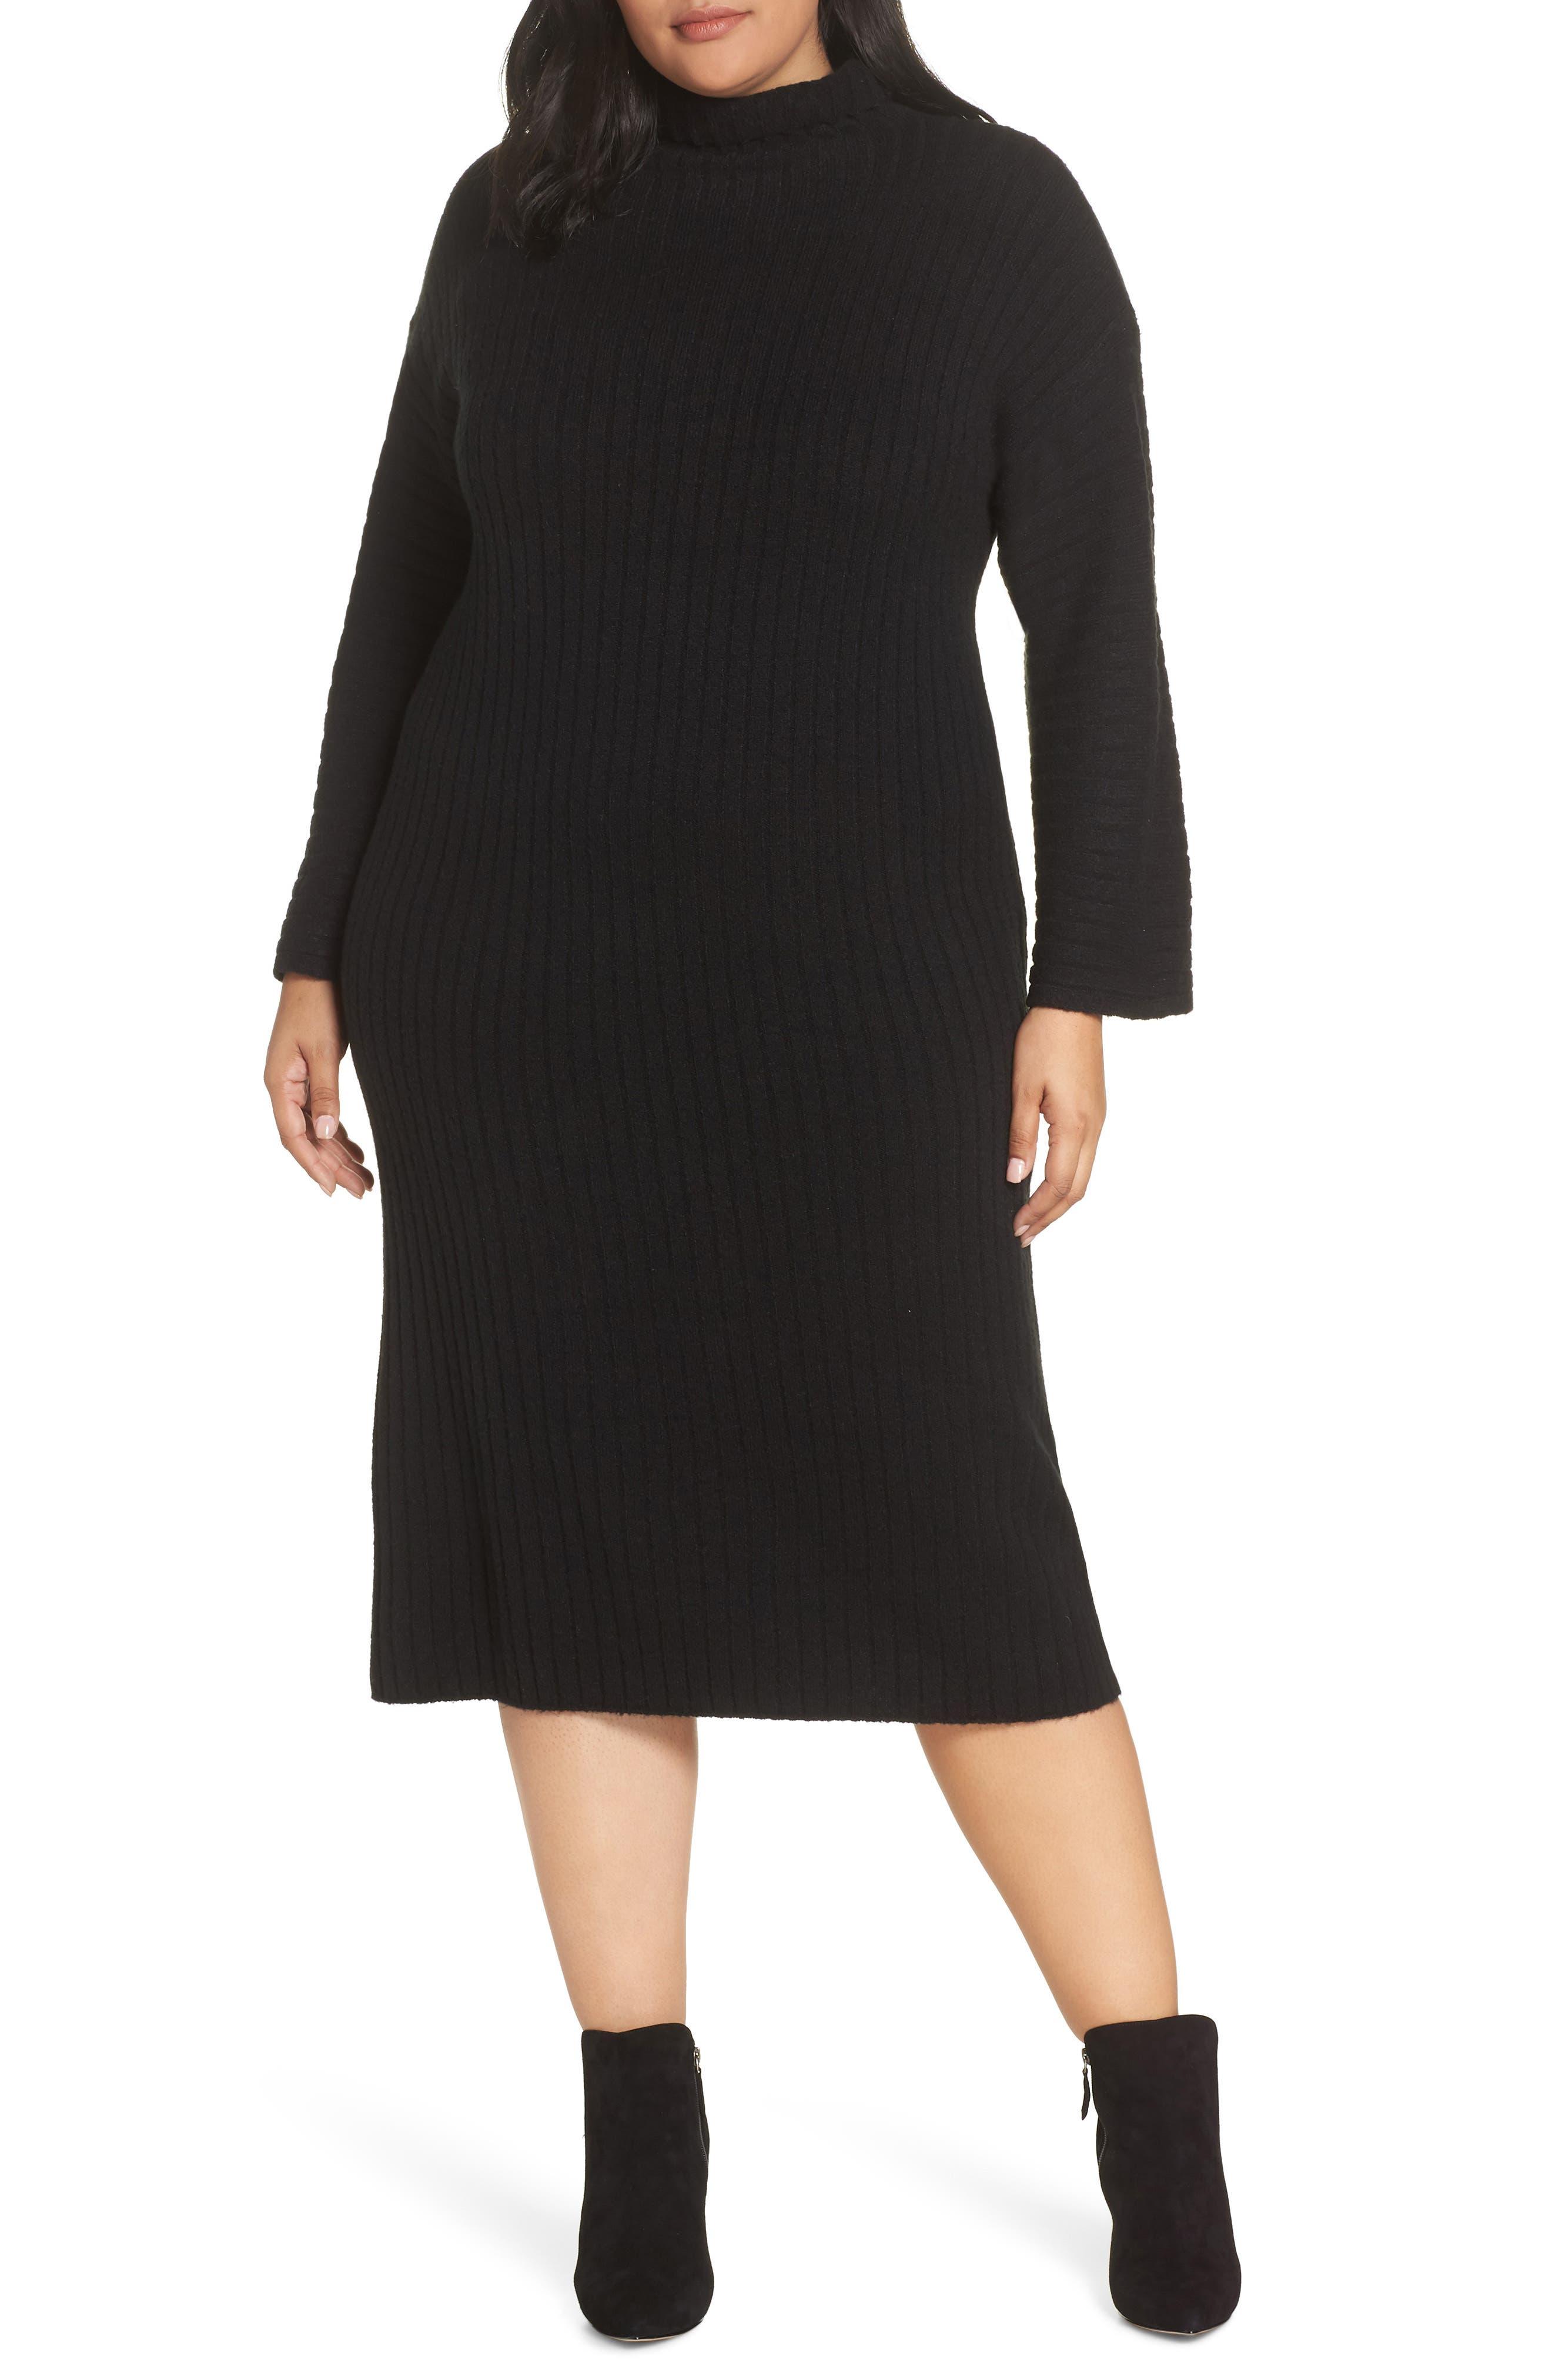 LEITH, Ribbed Midi Sweater Dress, Main thumbnail 1, color, BLACK